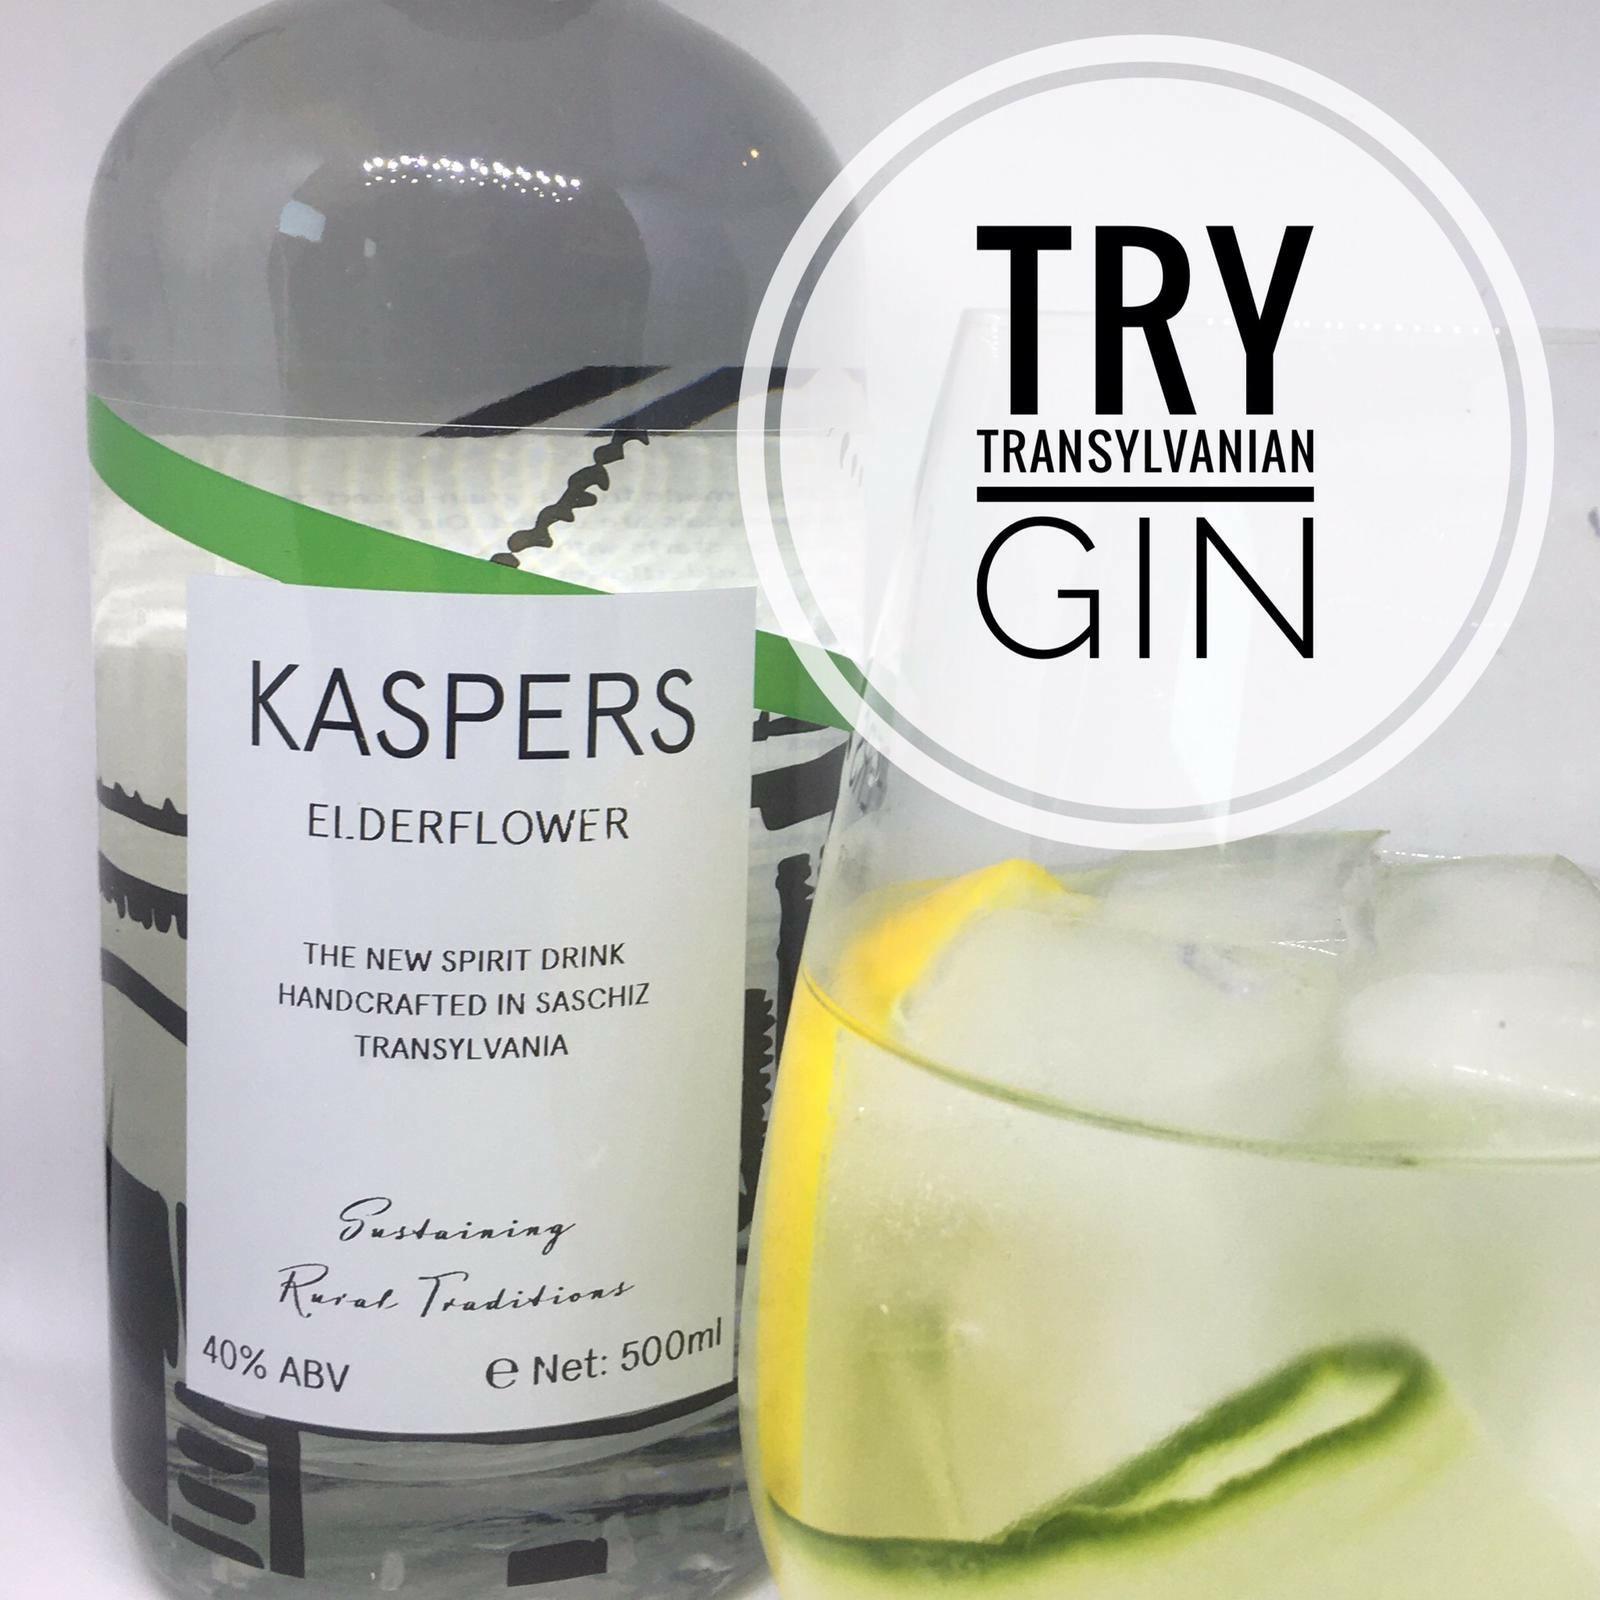 Try Transylvanian Gin